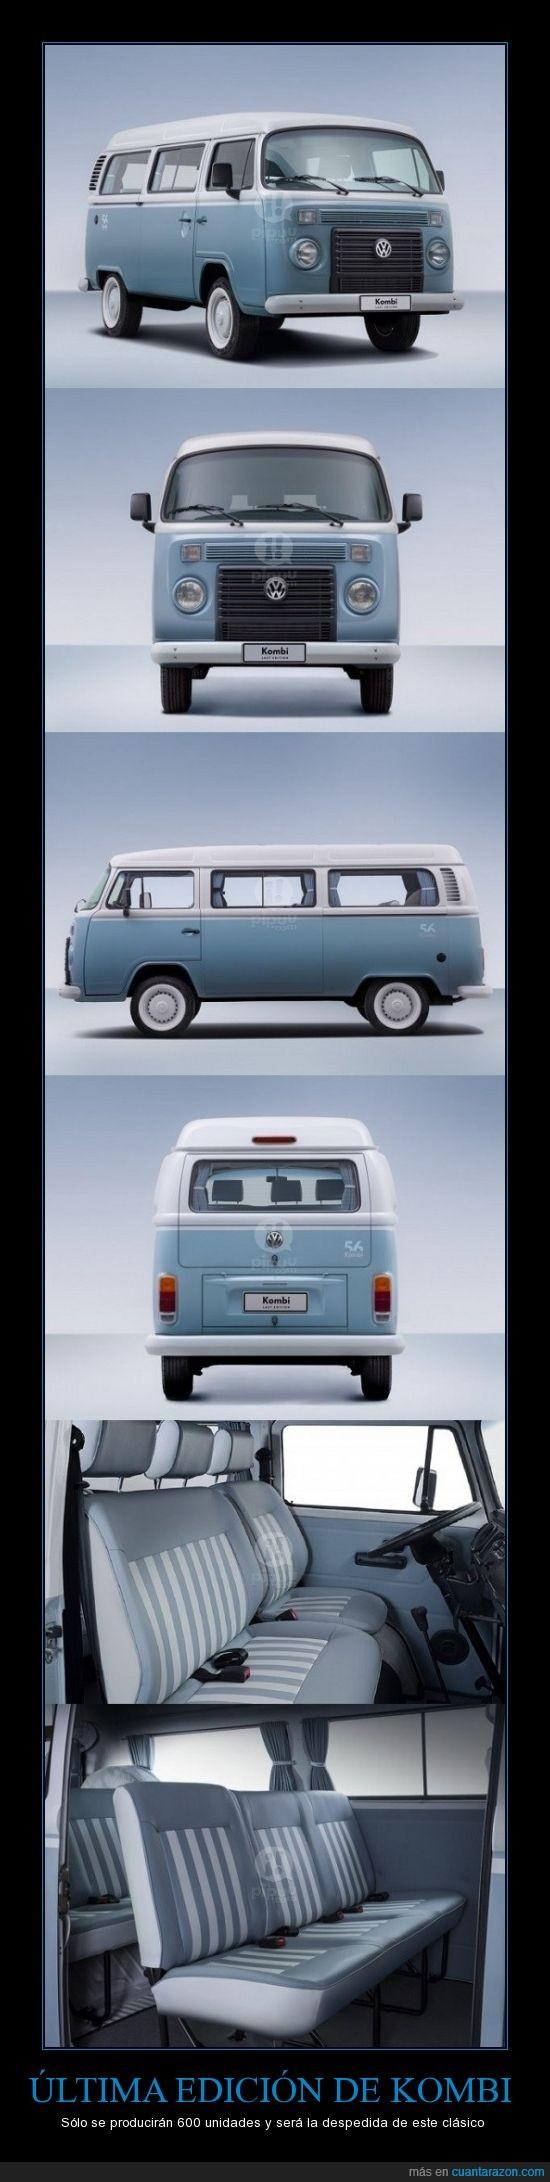 Kombi,se fabrican en Brasil,última edición,VW